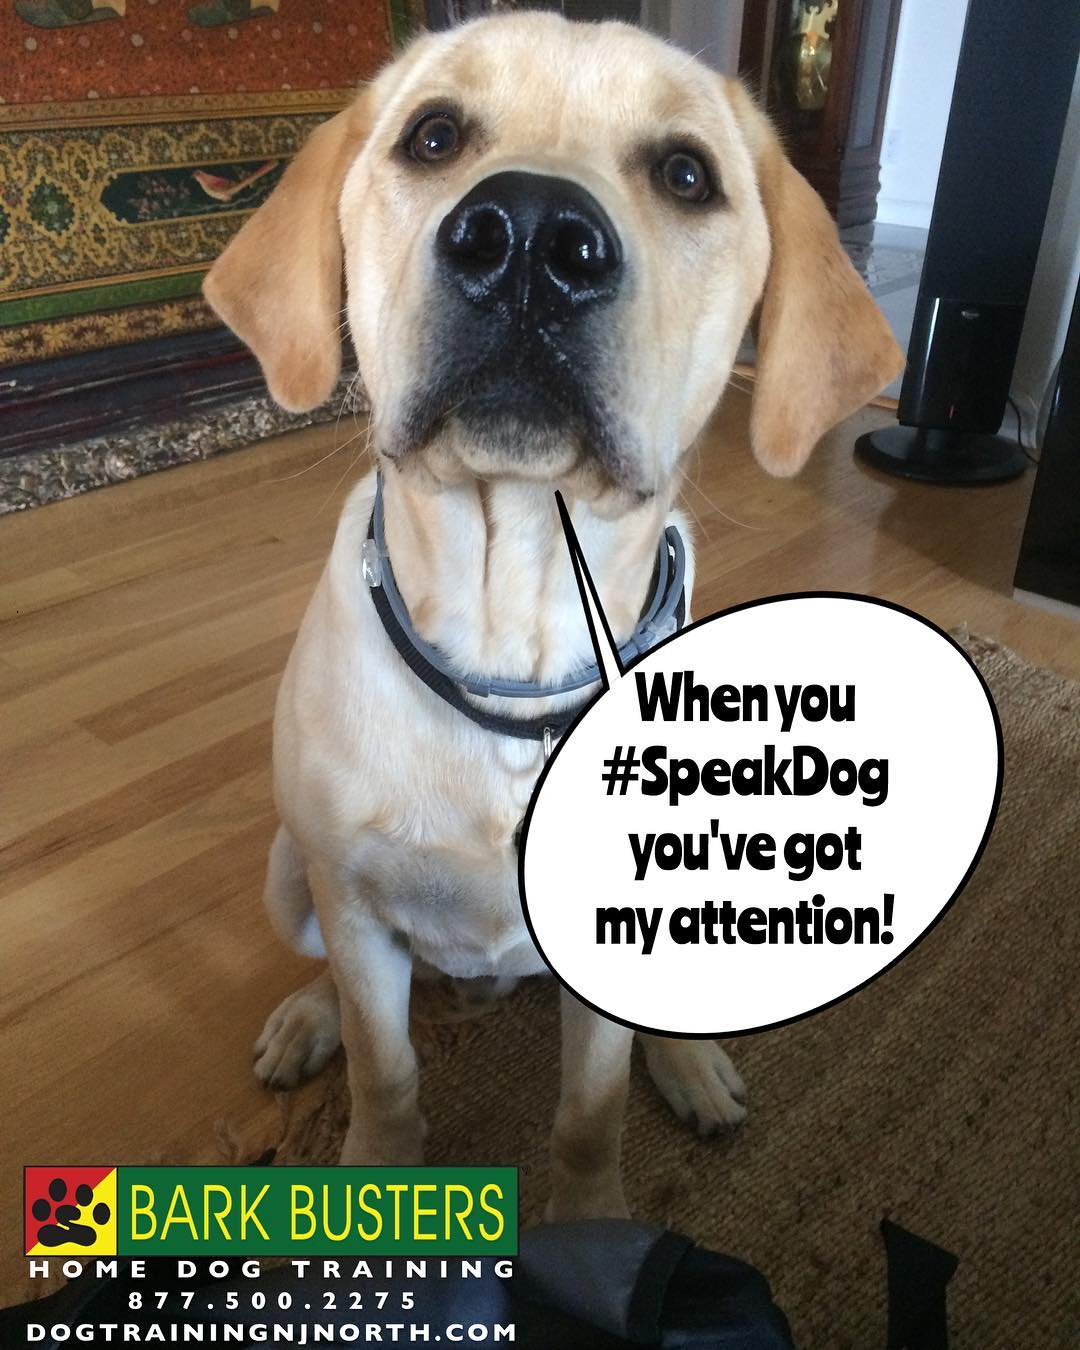 #dog #LabradorRetriever #BarkBusters #dogtraining #dogtrainerNorthernNewJersey #speakdog #dogs #puppies #HappyDogsHappyFamilies #LabsOfInstagram #dogsOfBarkBusters #Passaic